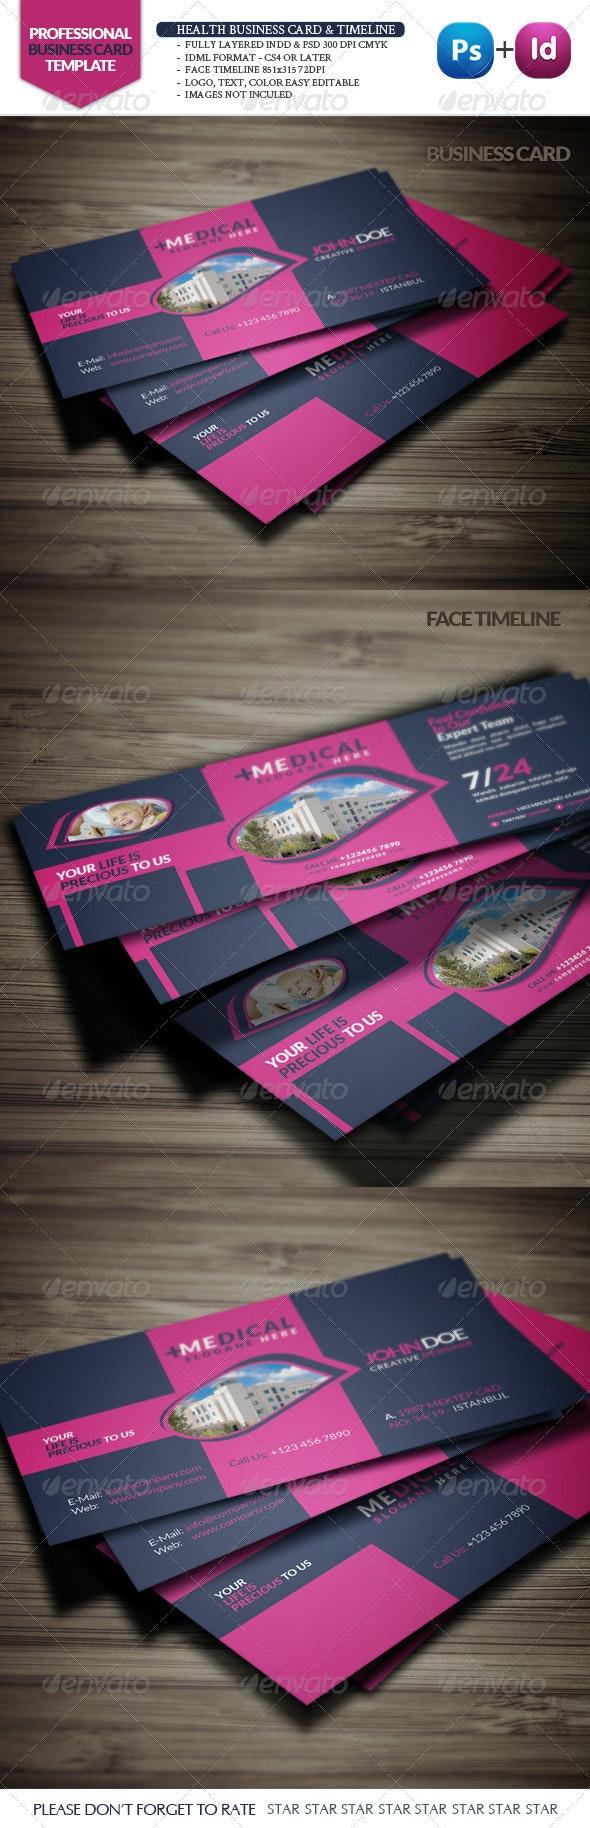 Health Business Card & Face Timeline - Creative Business Cards